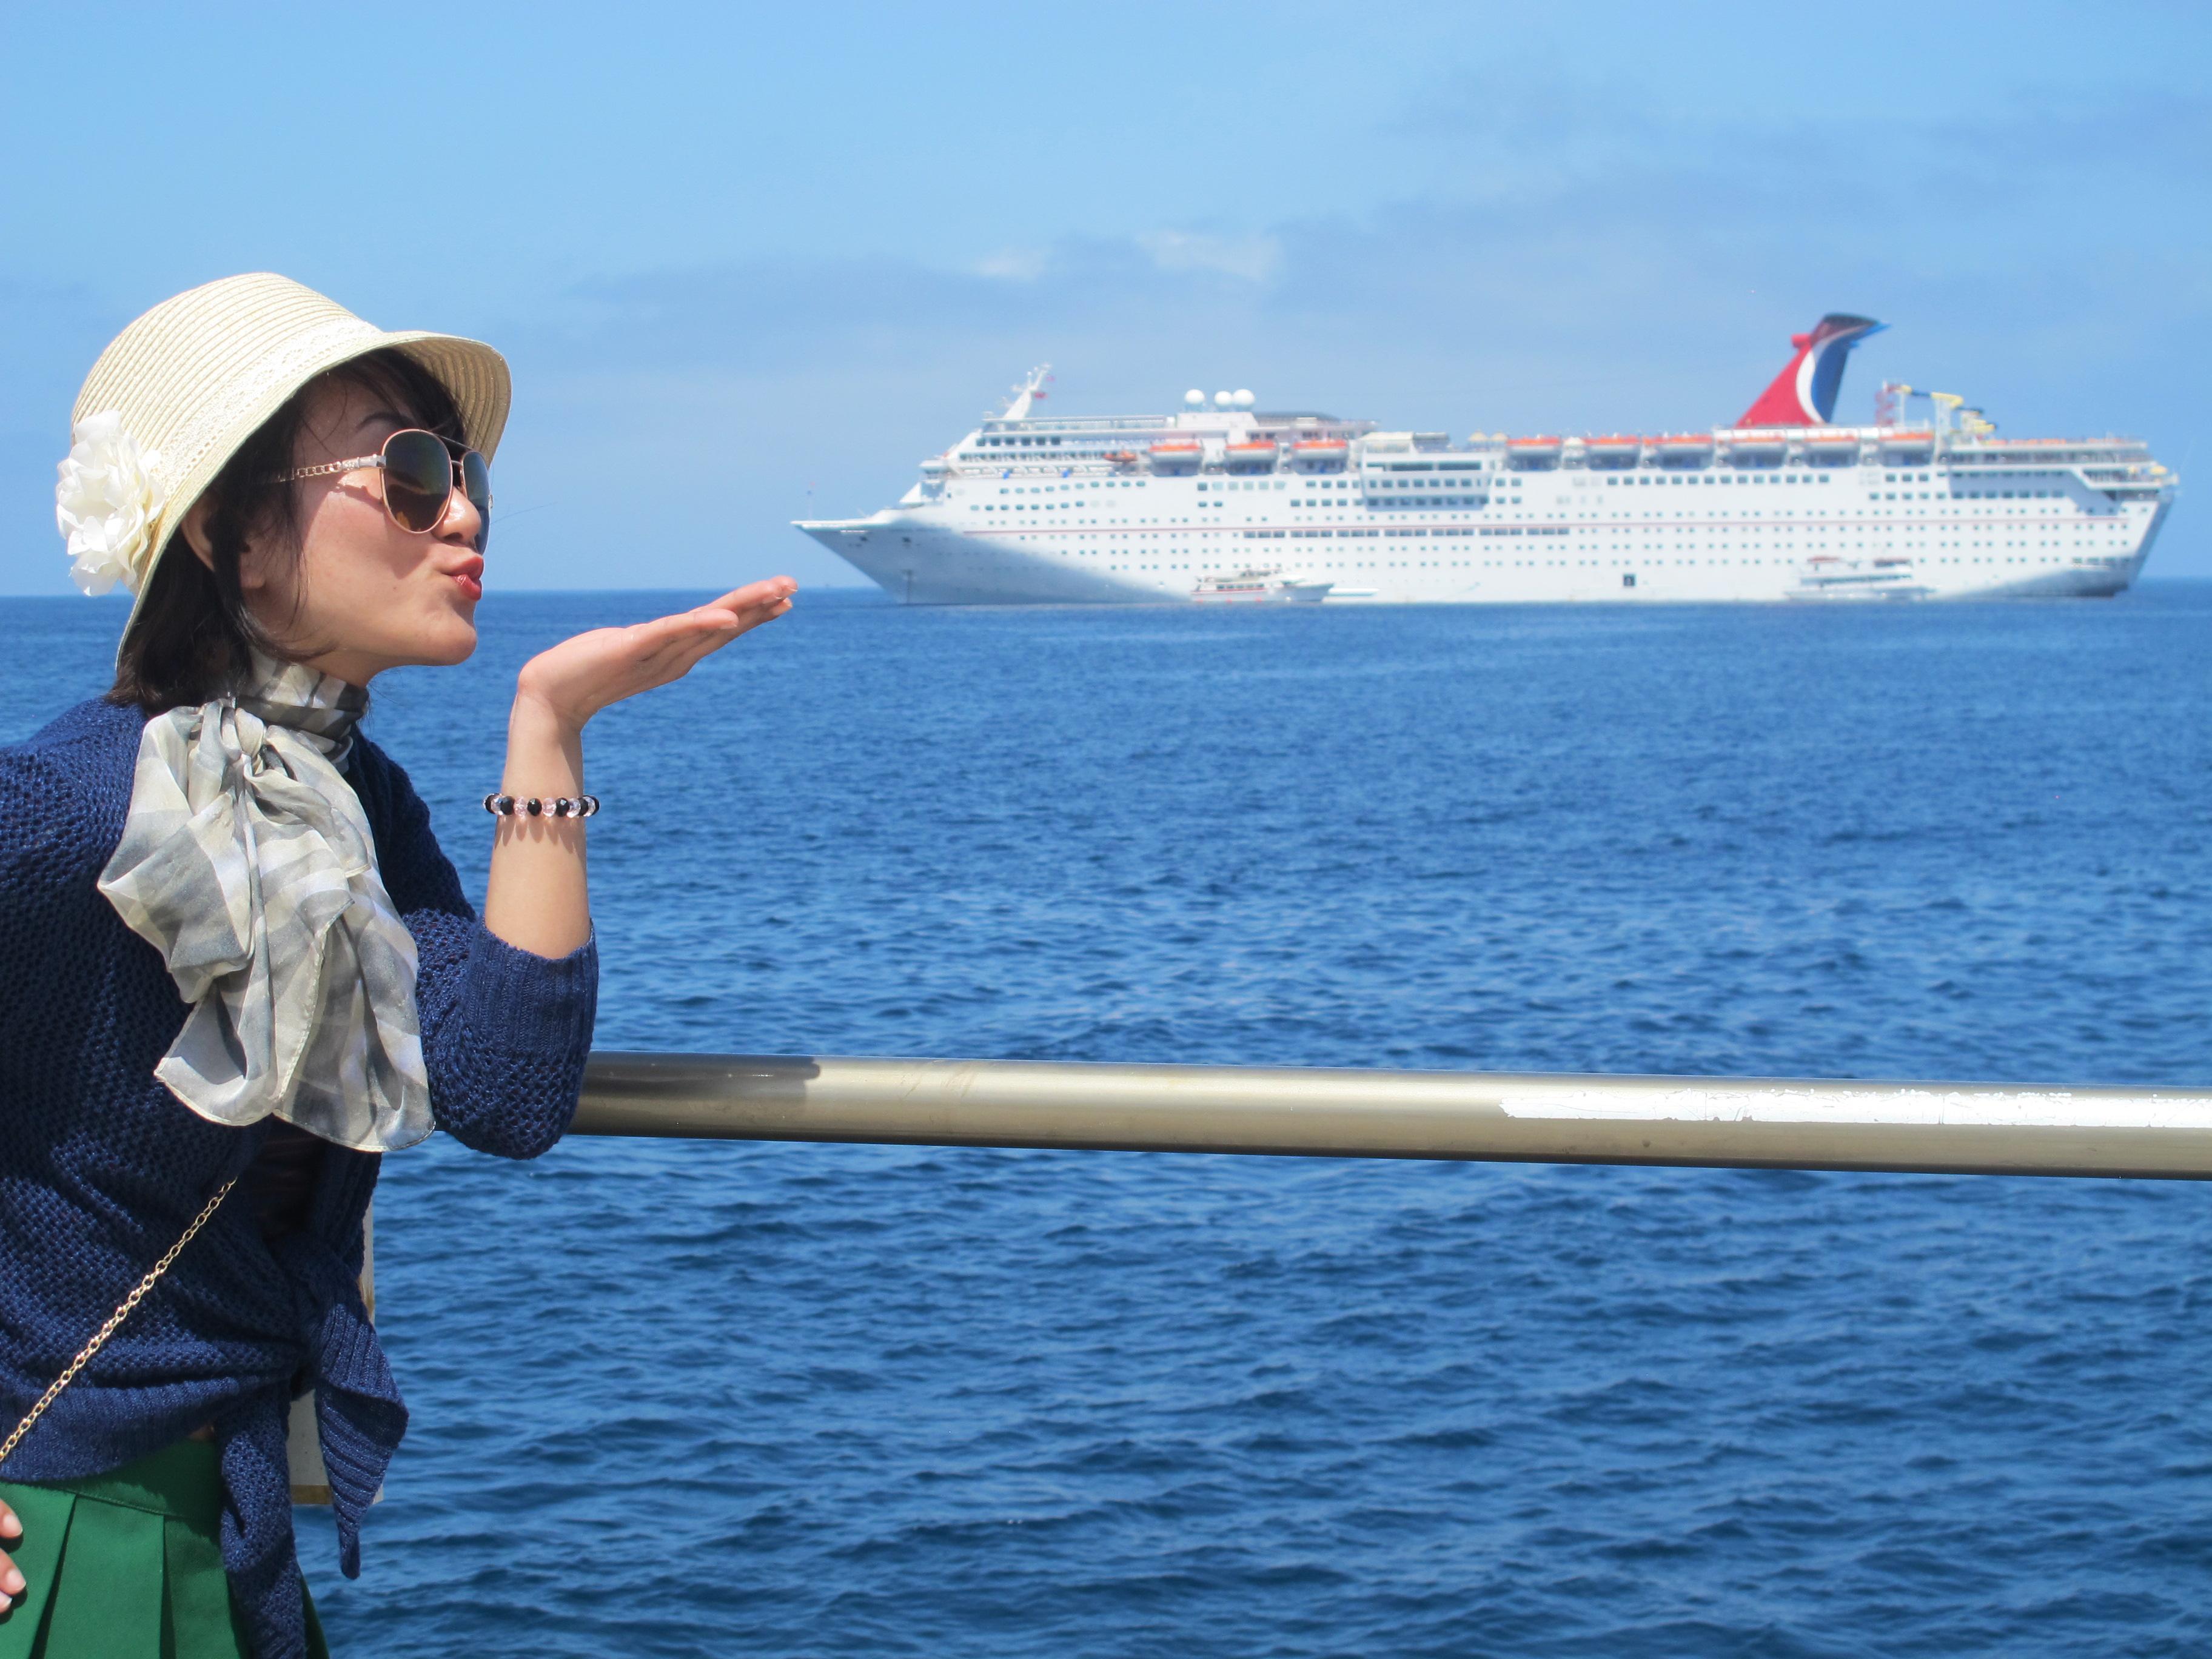 Linh chụp tại Catalina Island